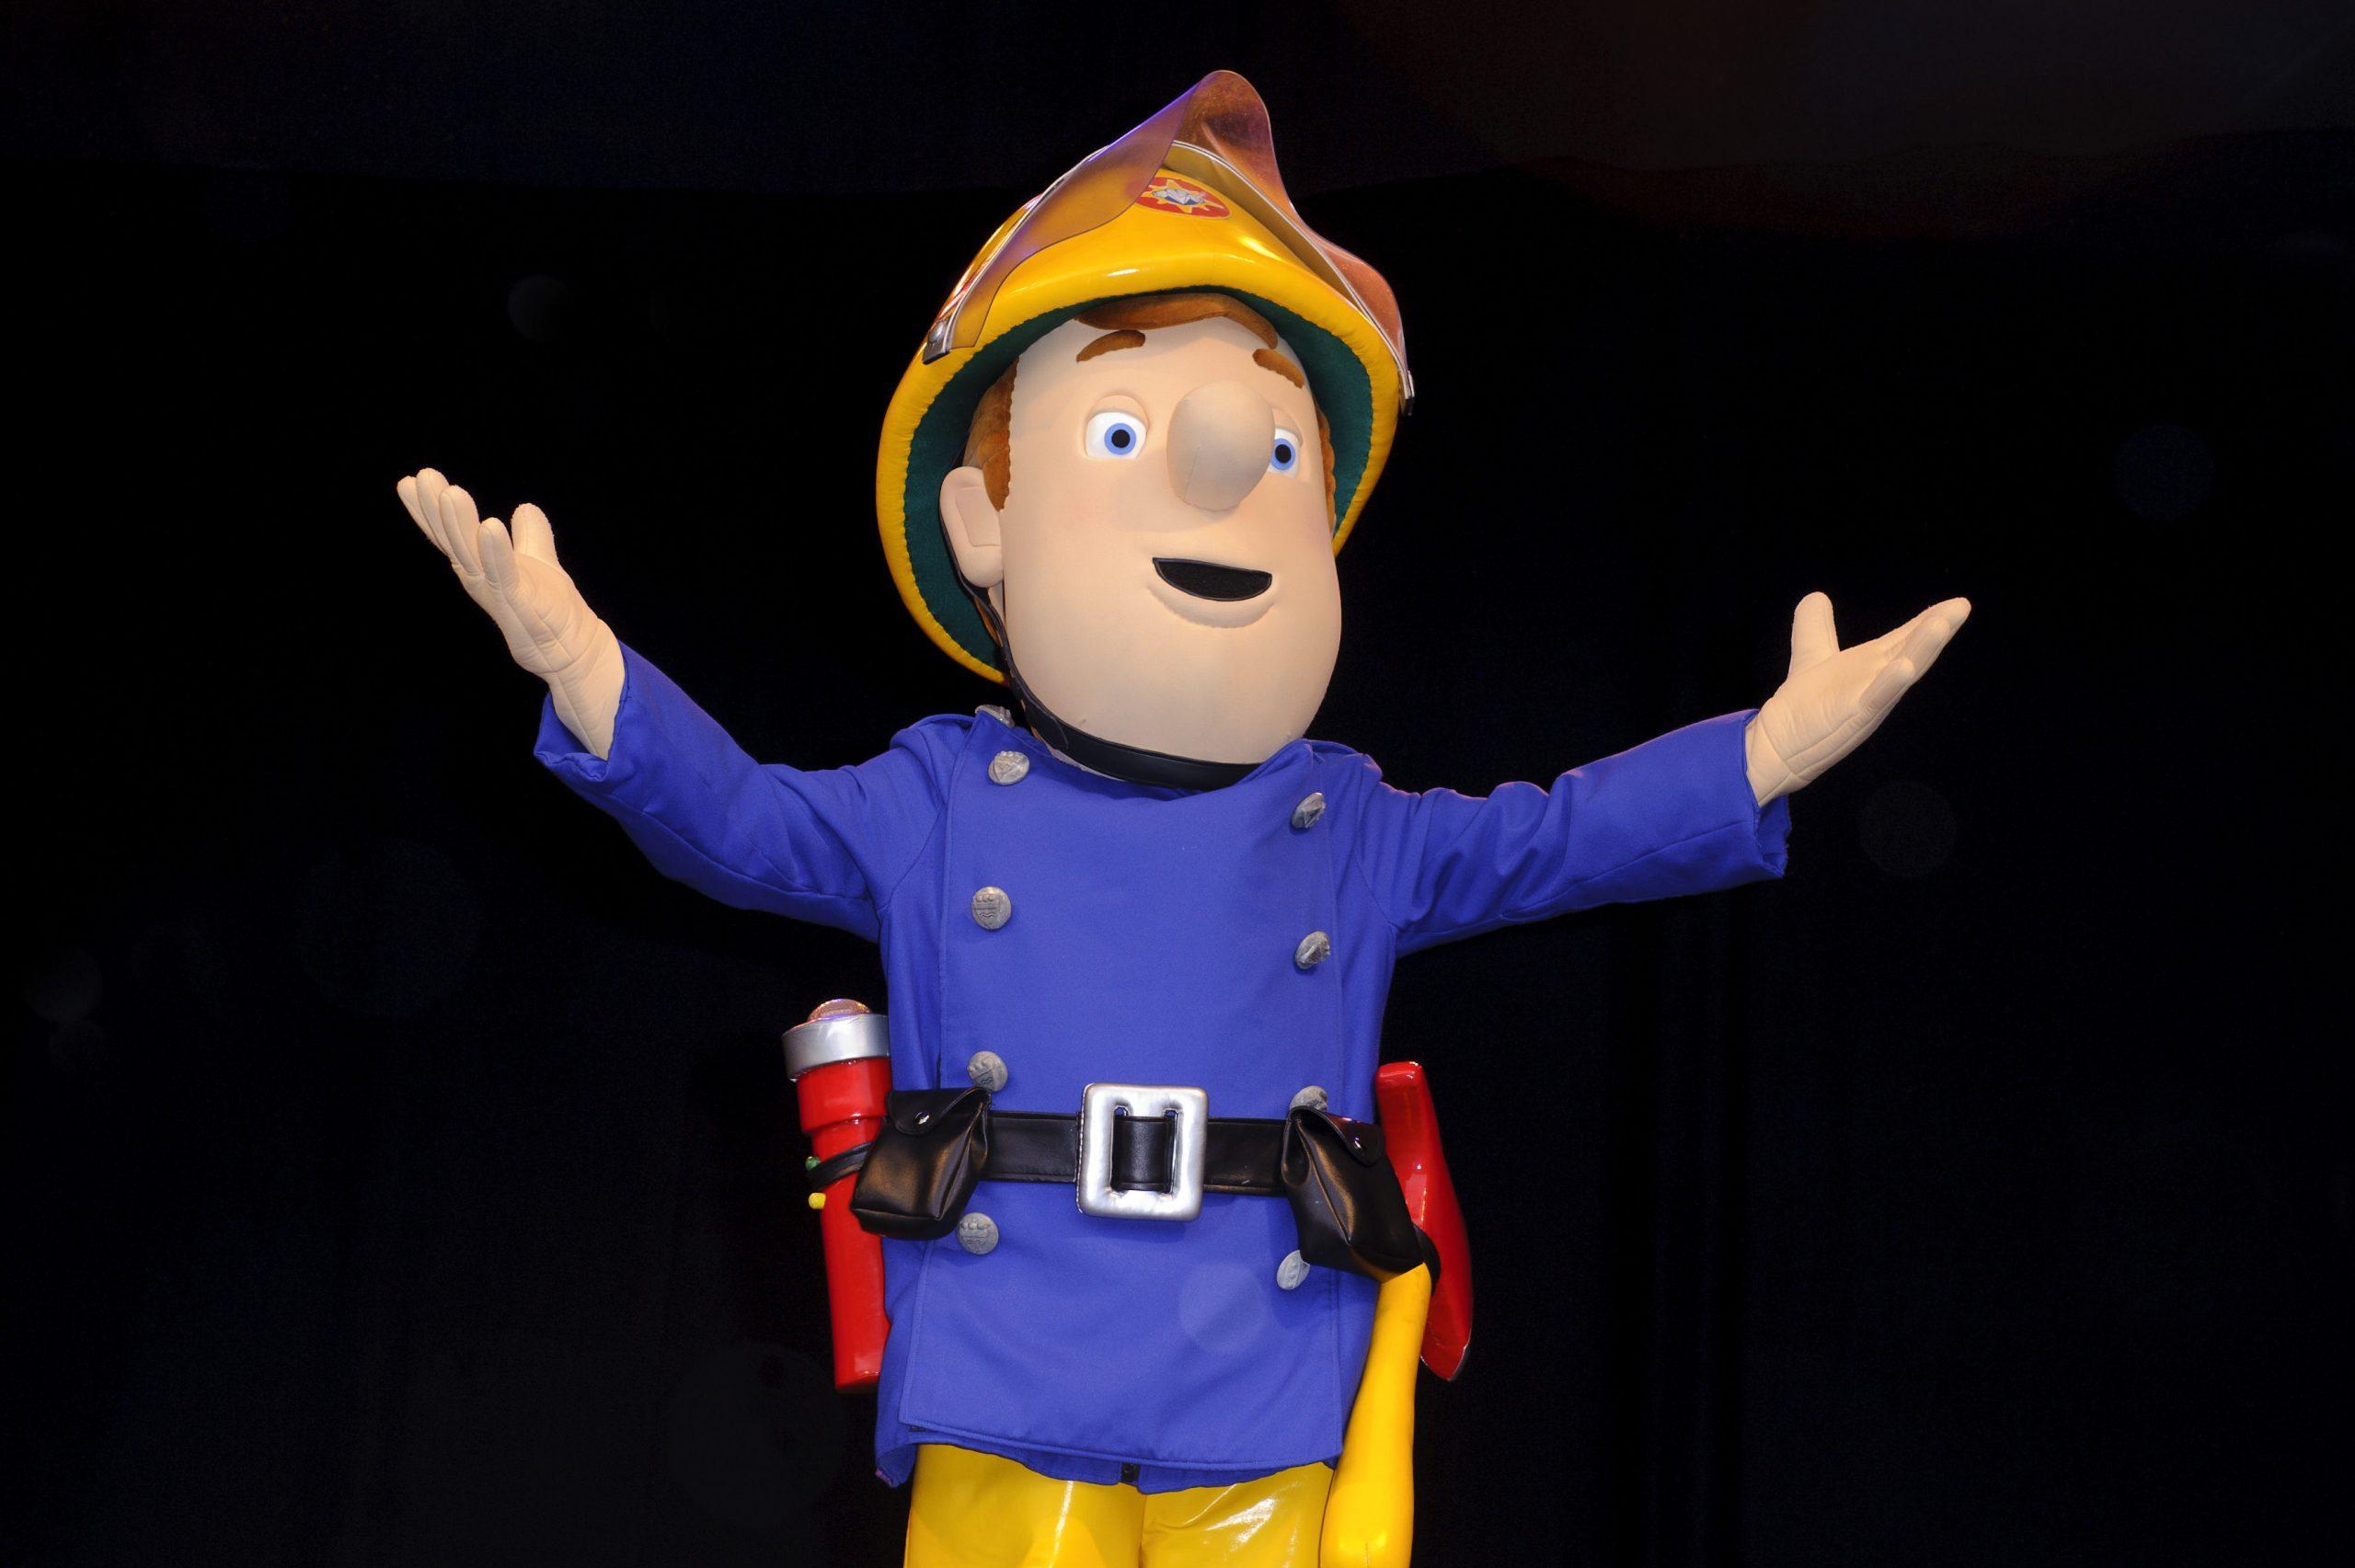 'Legoland Live! My First Festival', Windsor, Berkshire, Britain. - 17 Jul 2011